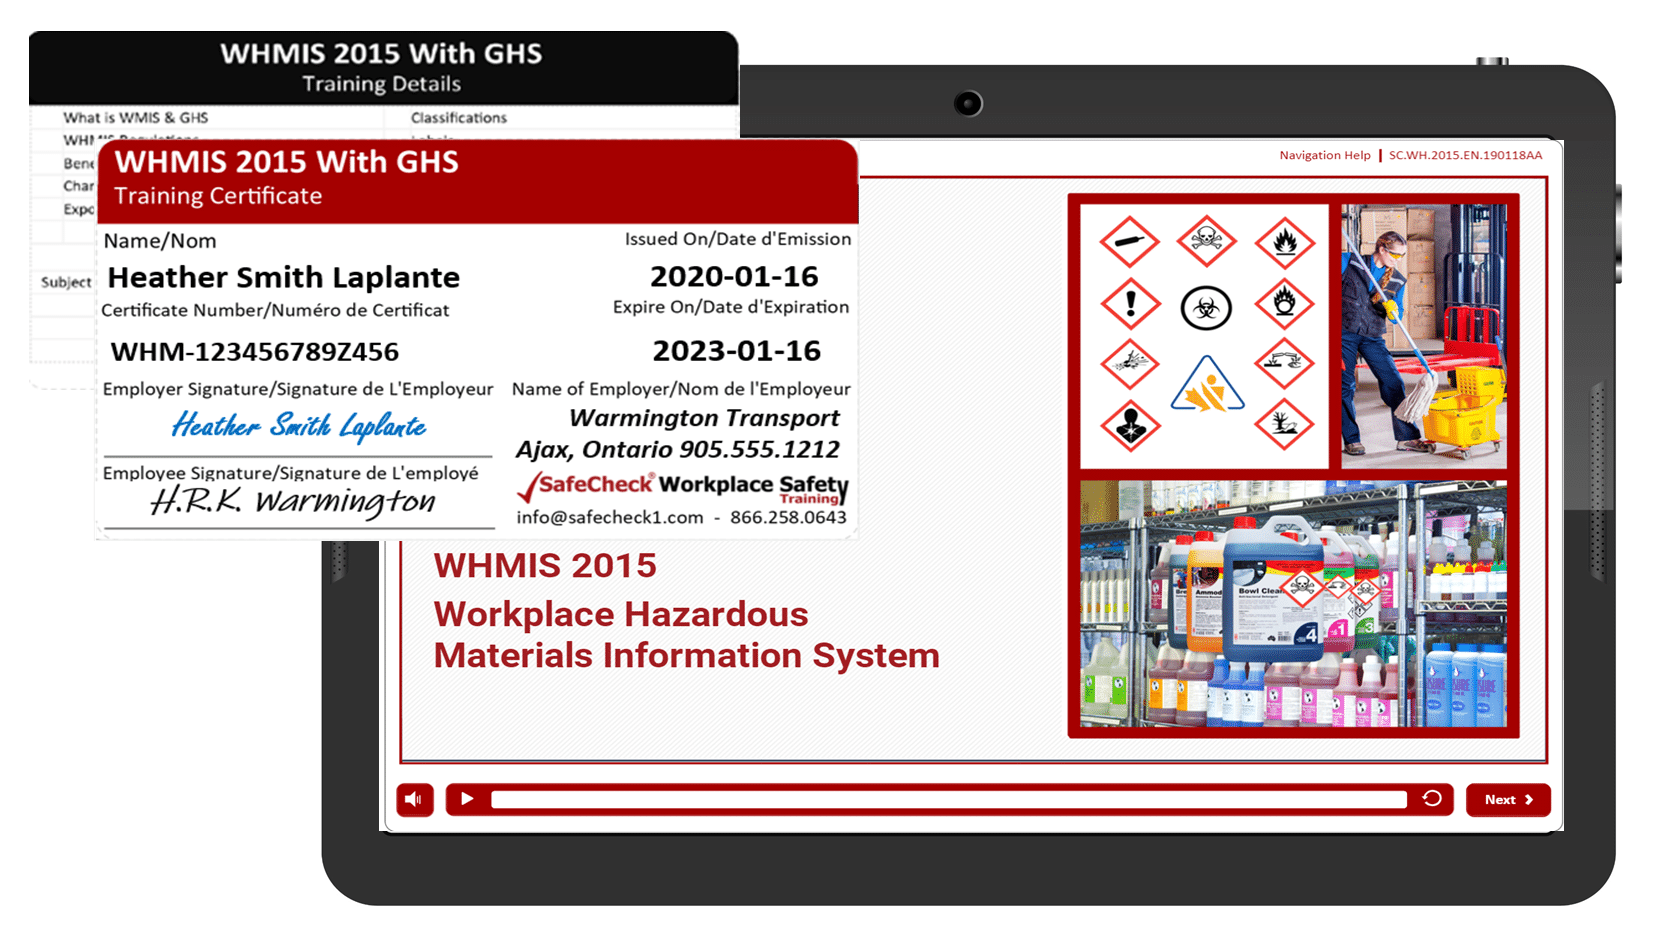 WHMIS-2015 W GHS